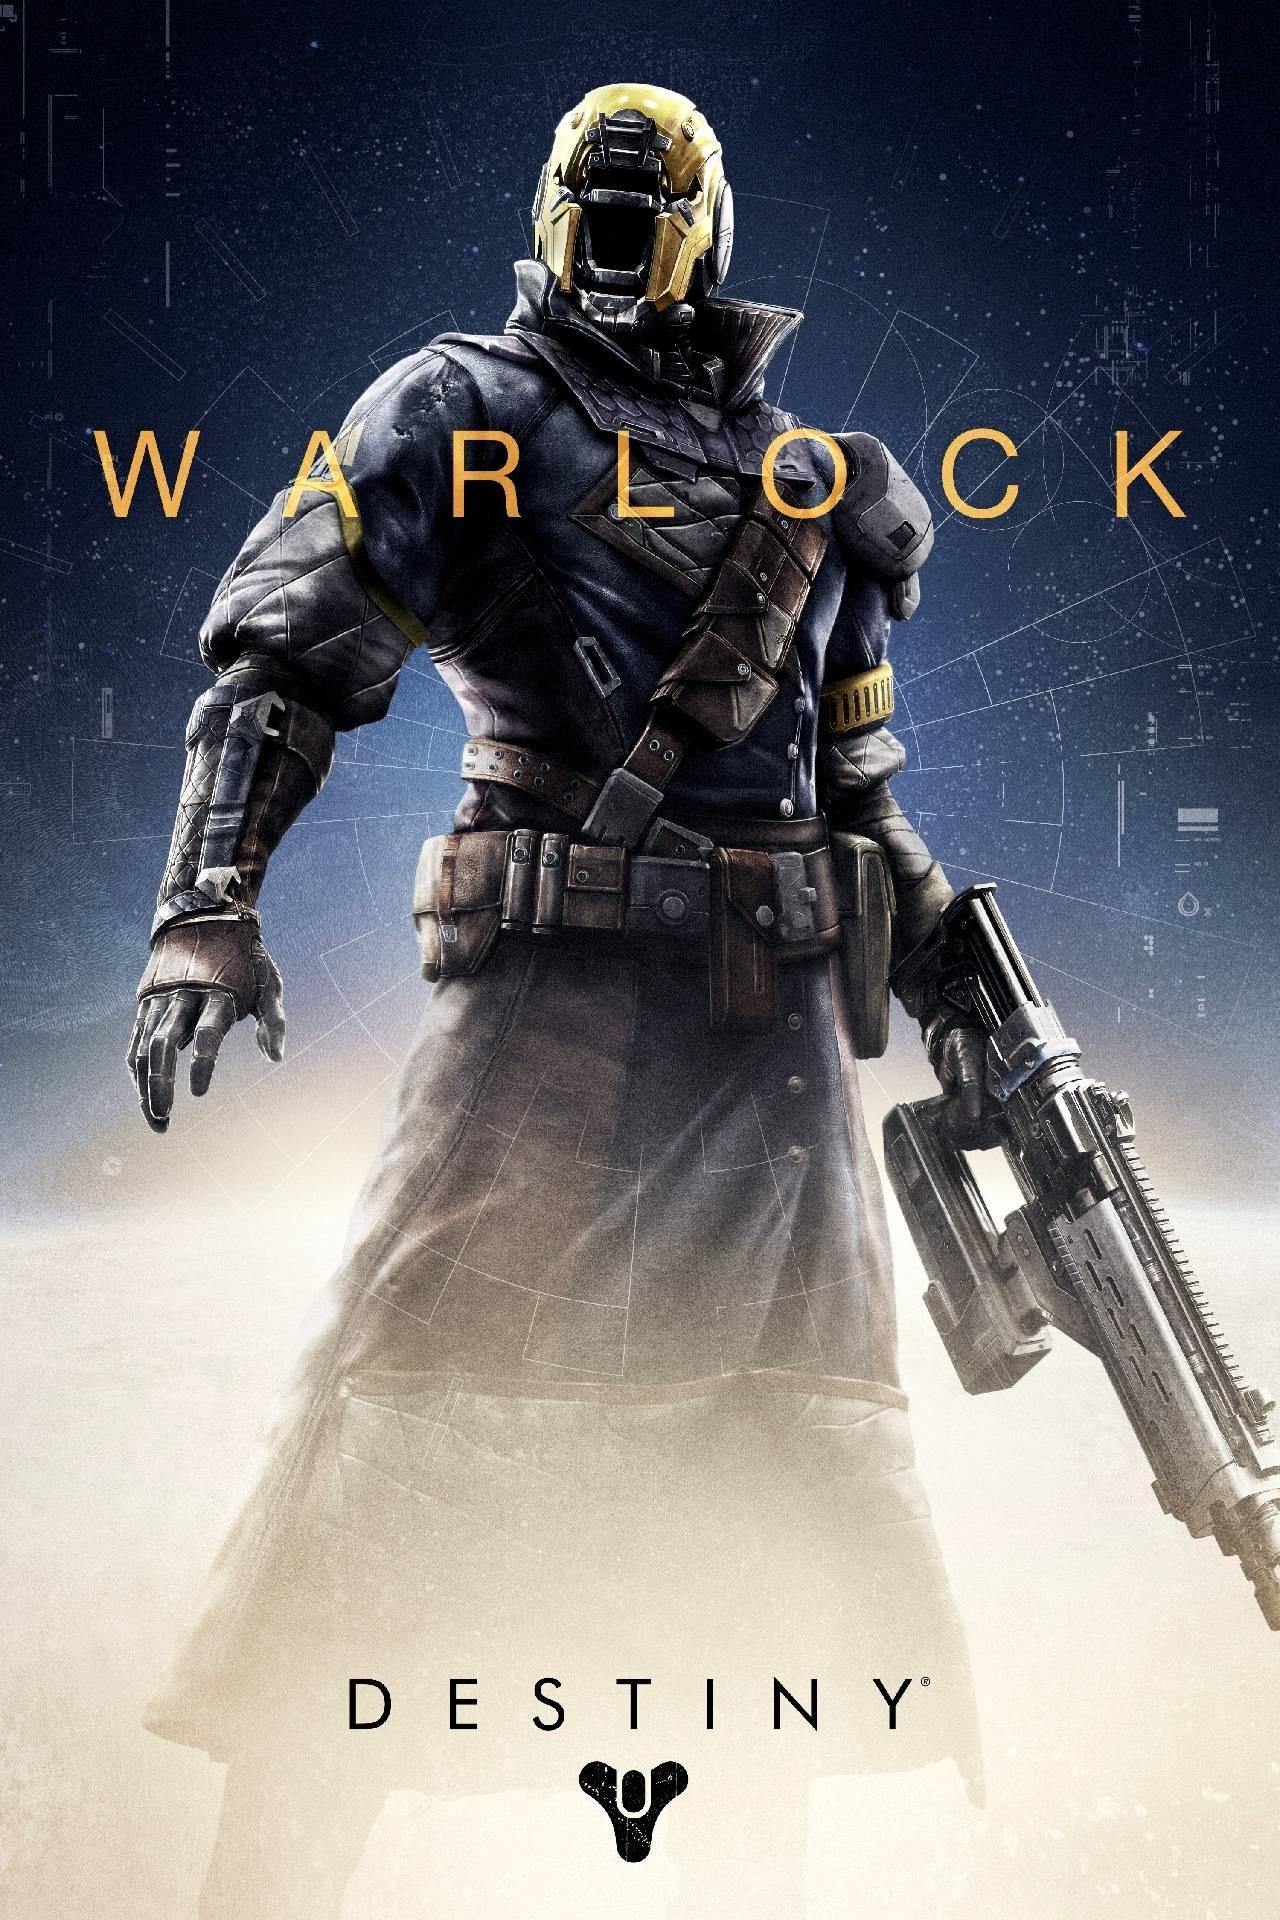 Edit: Hunter and Warlock